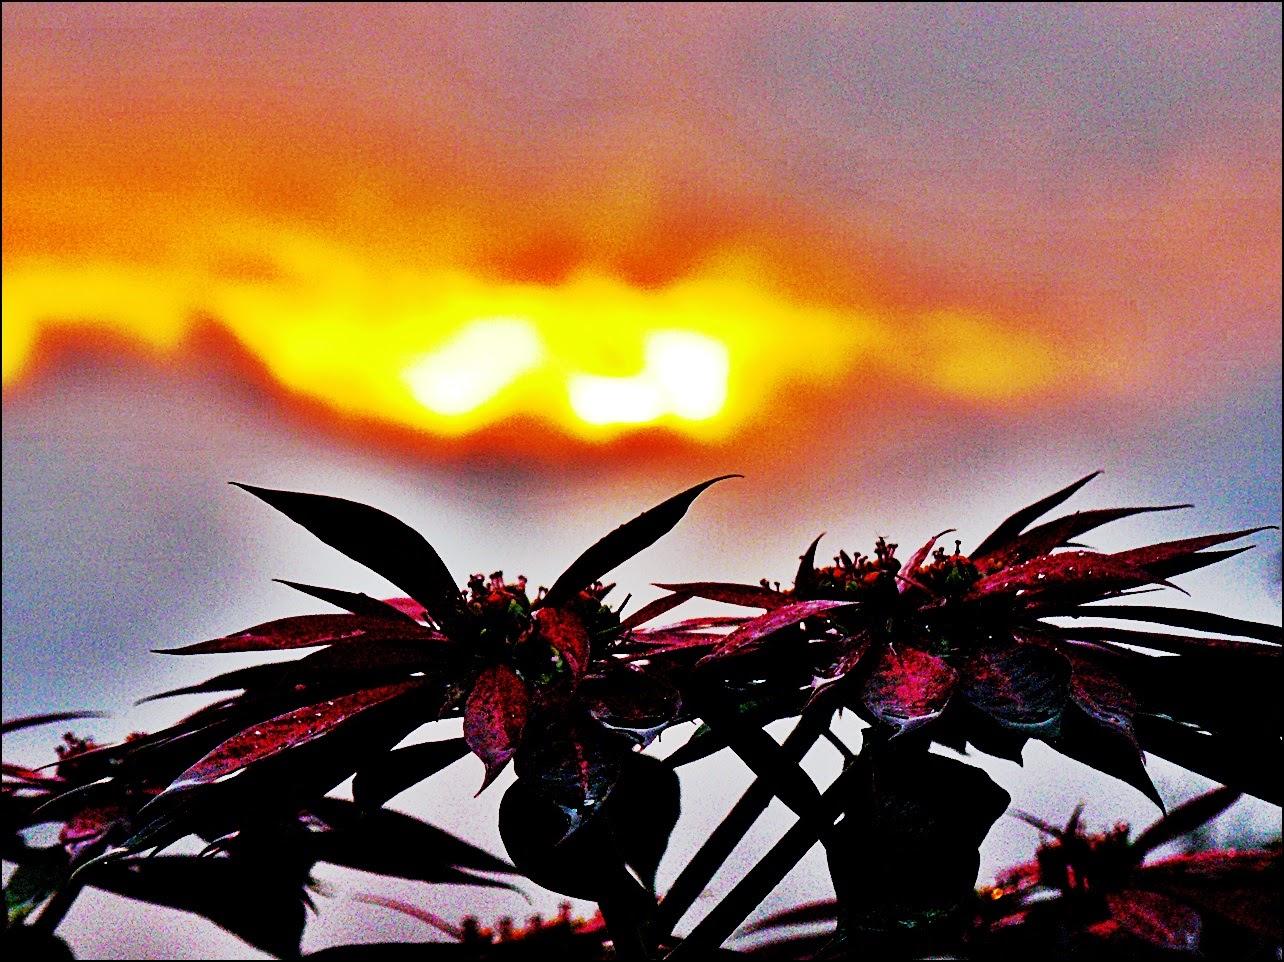 Orange sunset over red poinsettia in Costa Rica